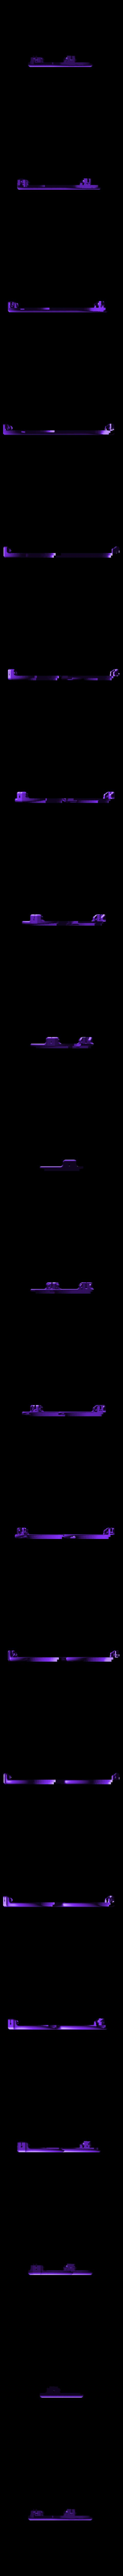 sunglasses3frame2.stl Download free STL file SUPLA SHADES  • 3D printable template, 3DShook